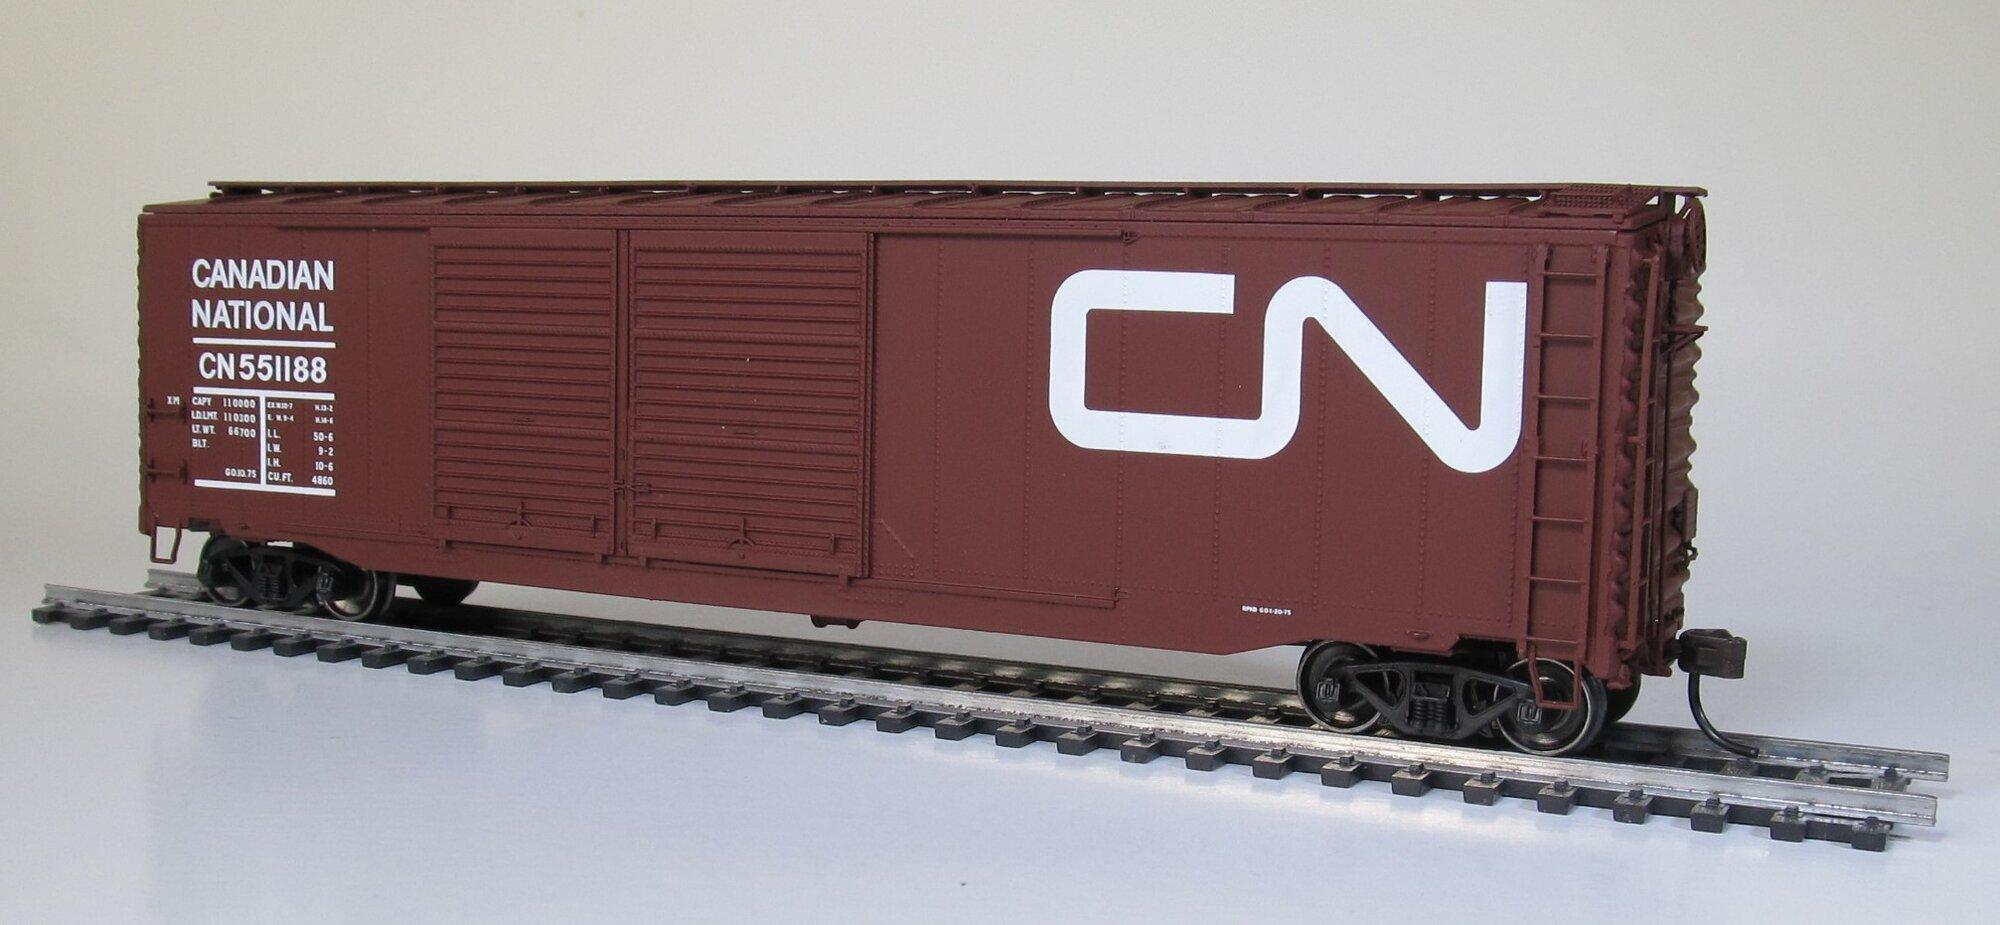 CN 551188_06-10-2020 (1).jpg